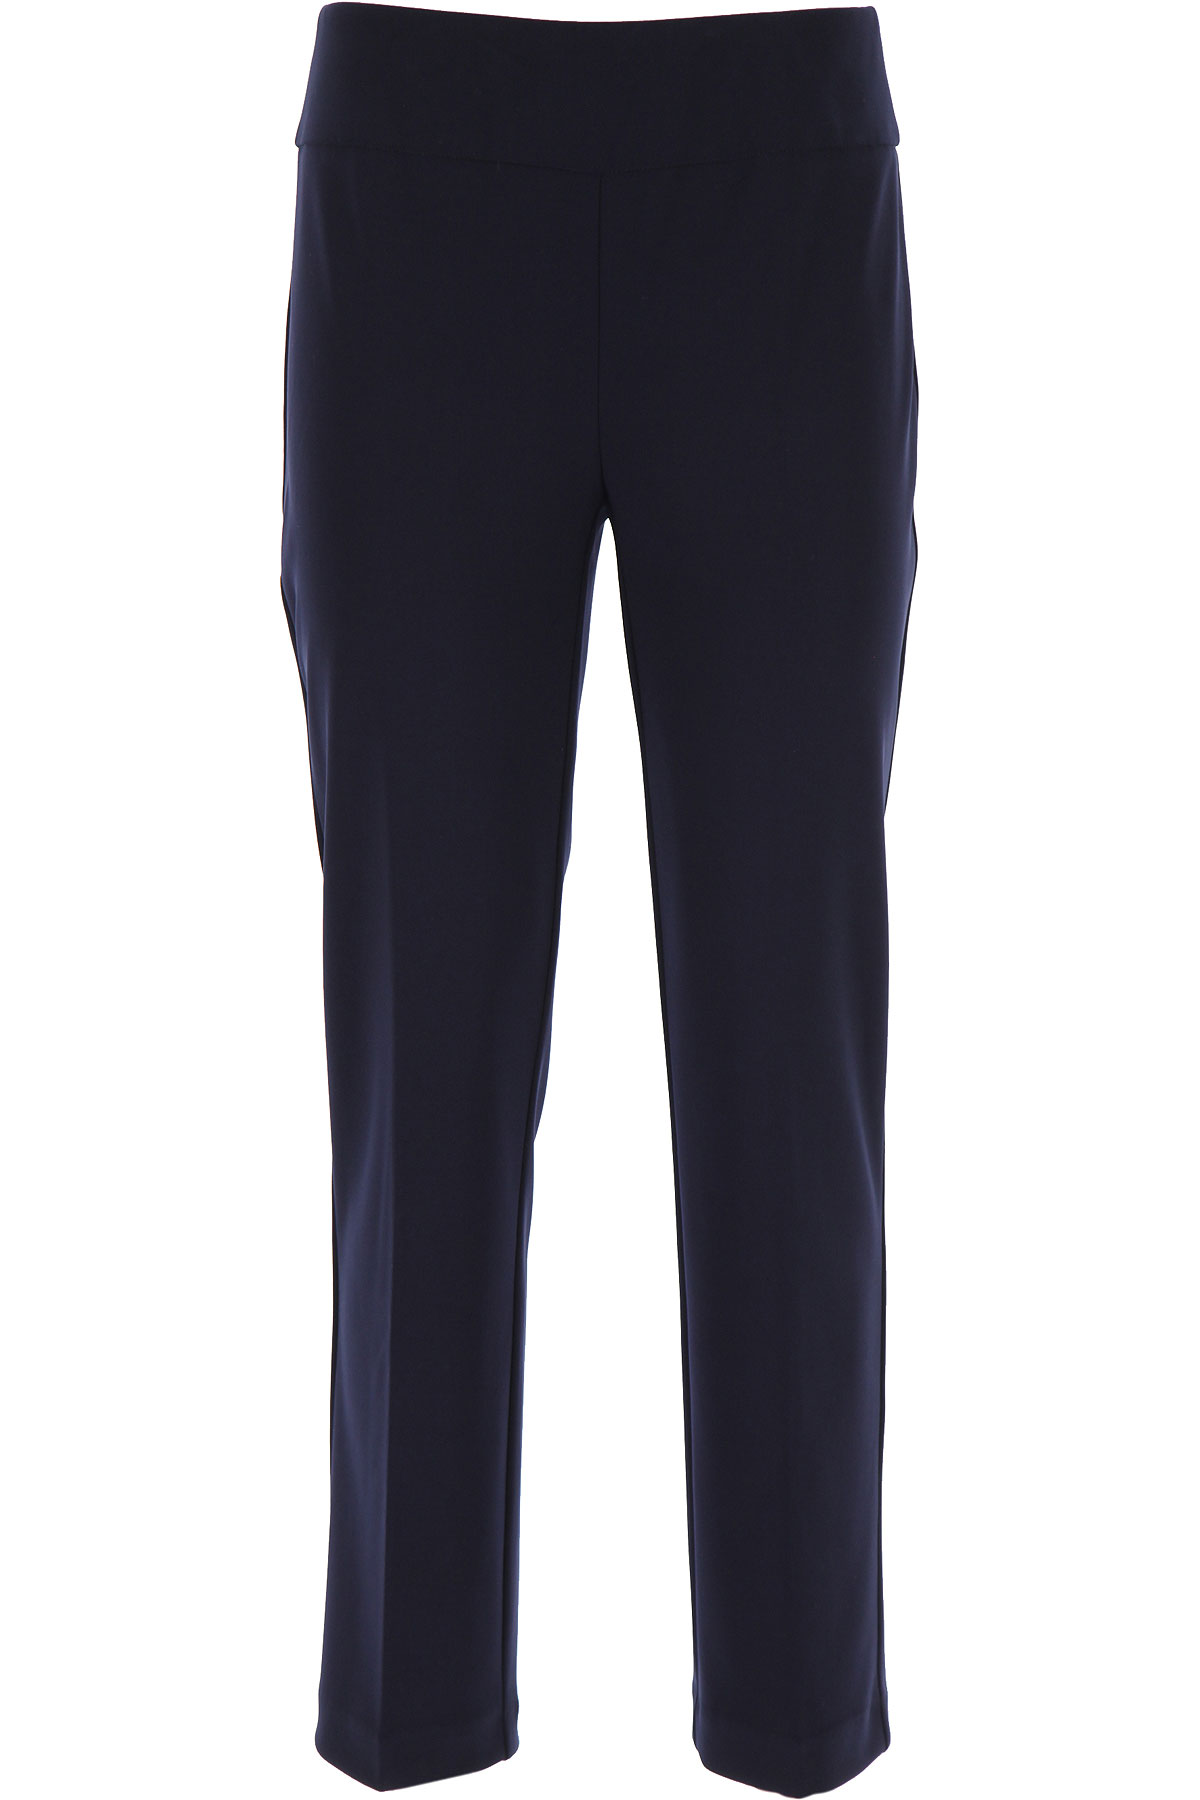 Joseph Ribkoff Pants for Women On Sale, Midnight Blue, polyester, 2019, 28 30 32